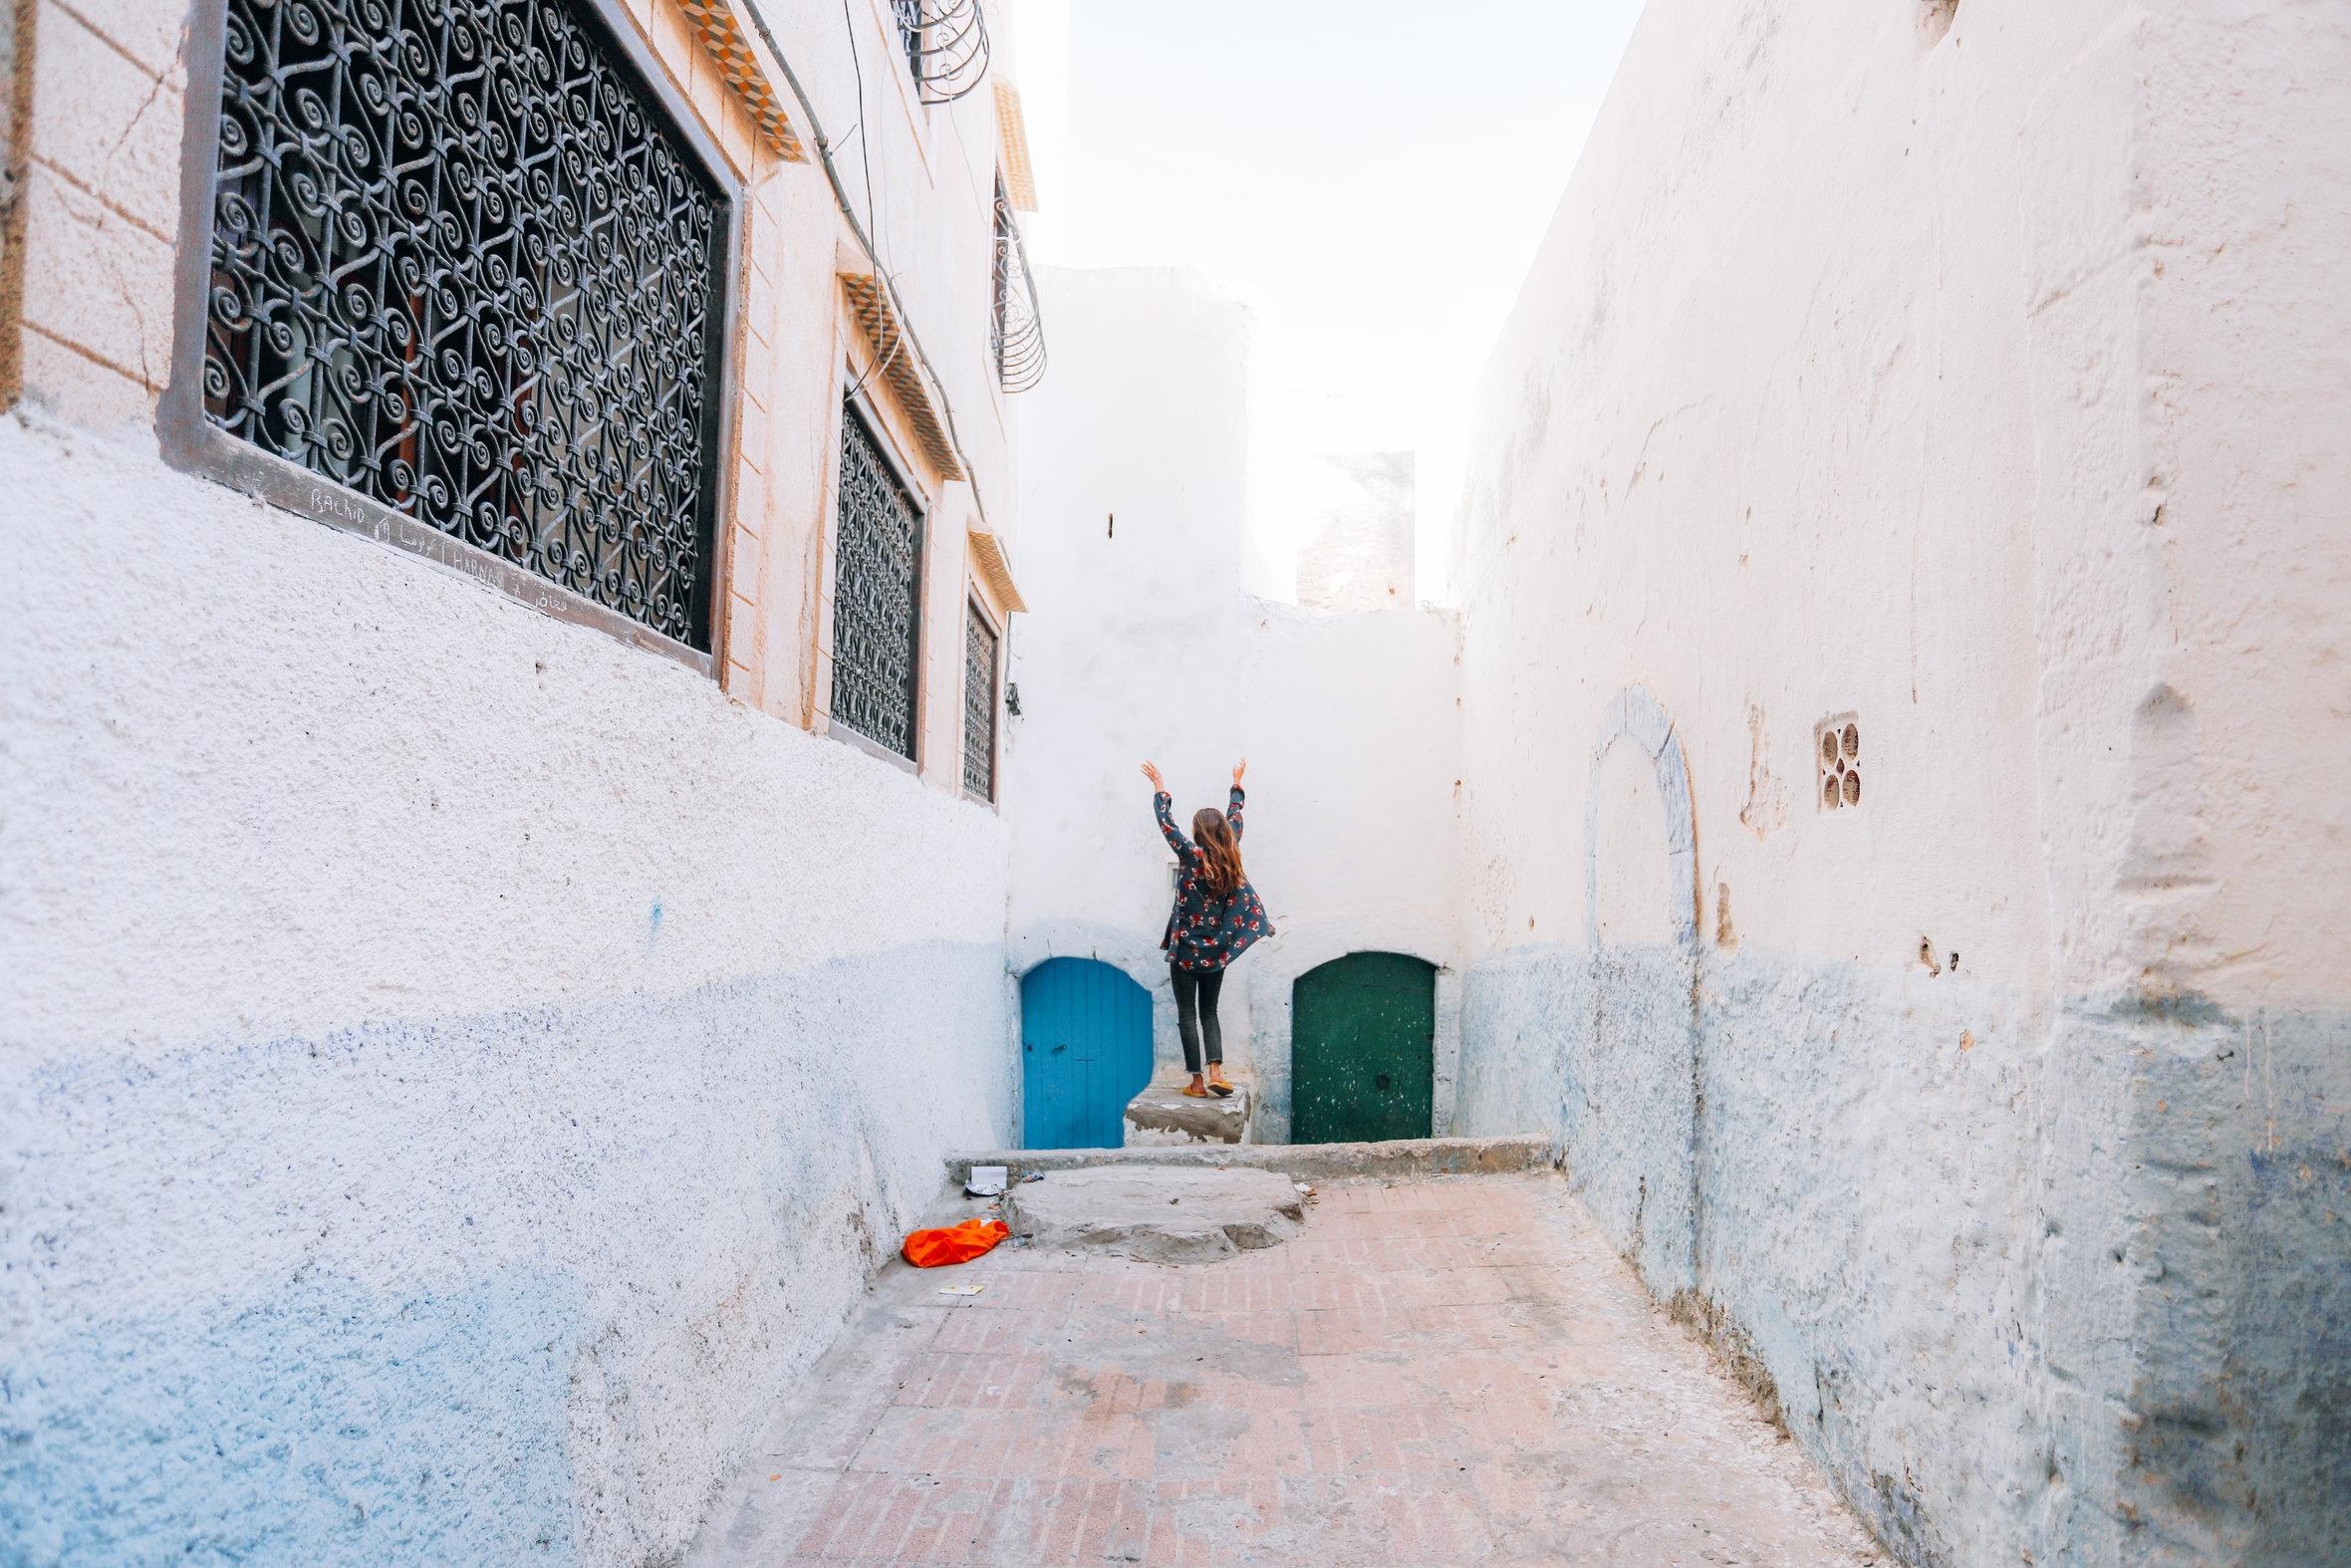 morocco_Nov_17-31.jpg